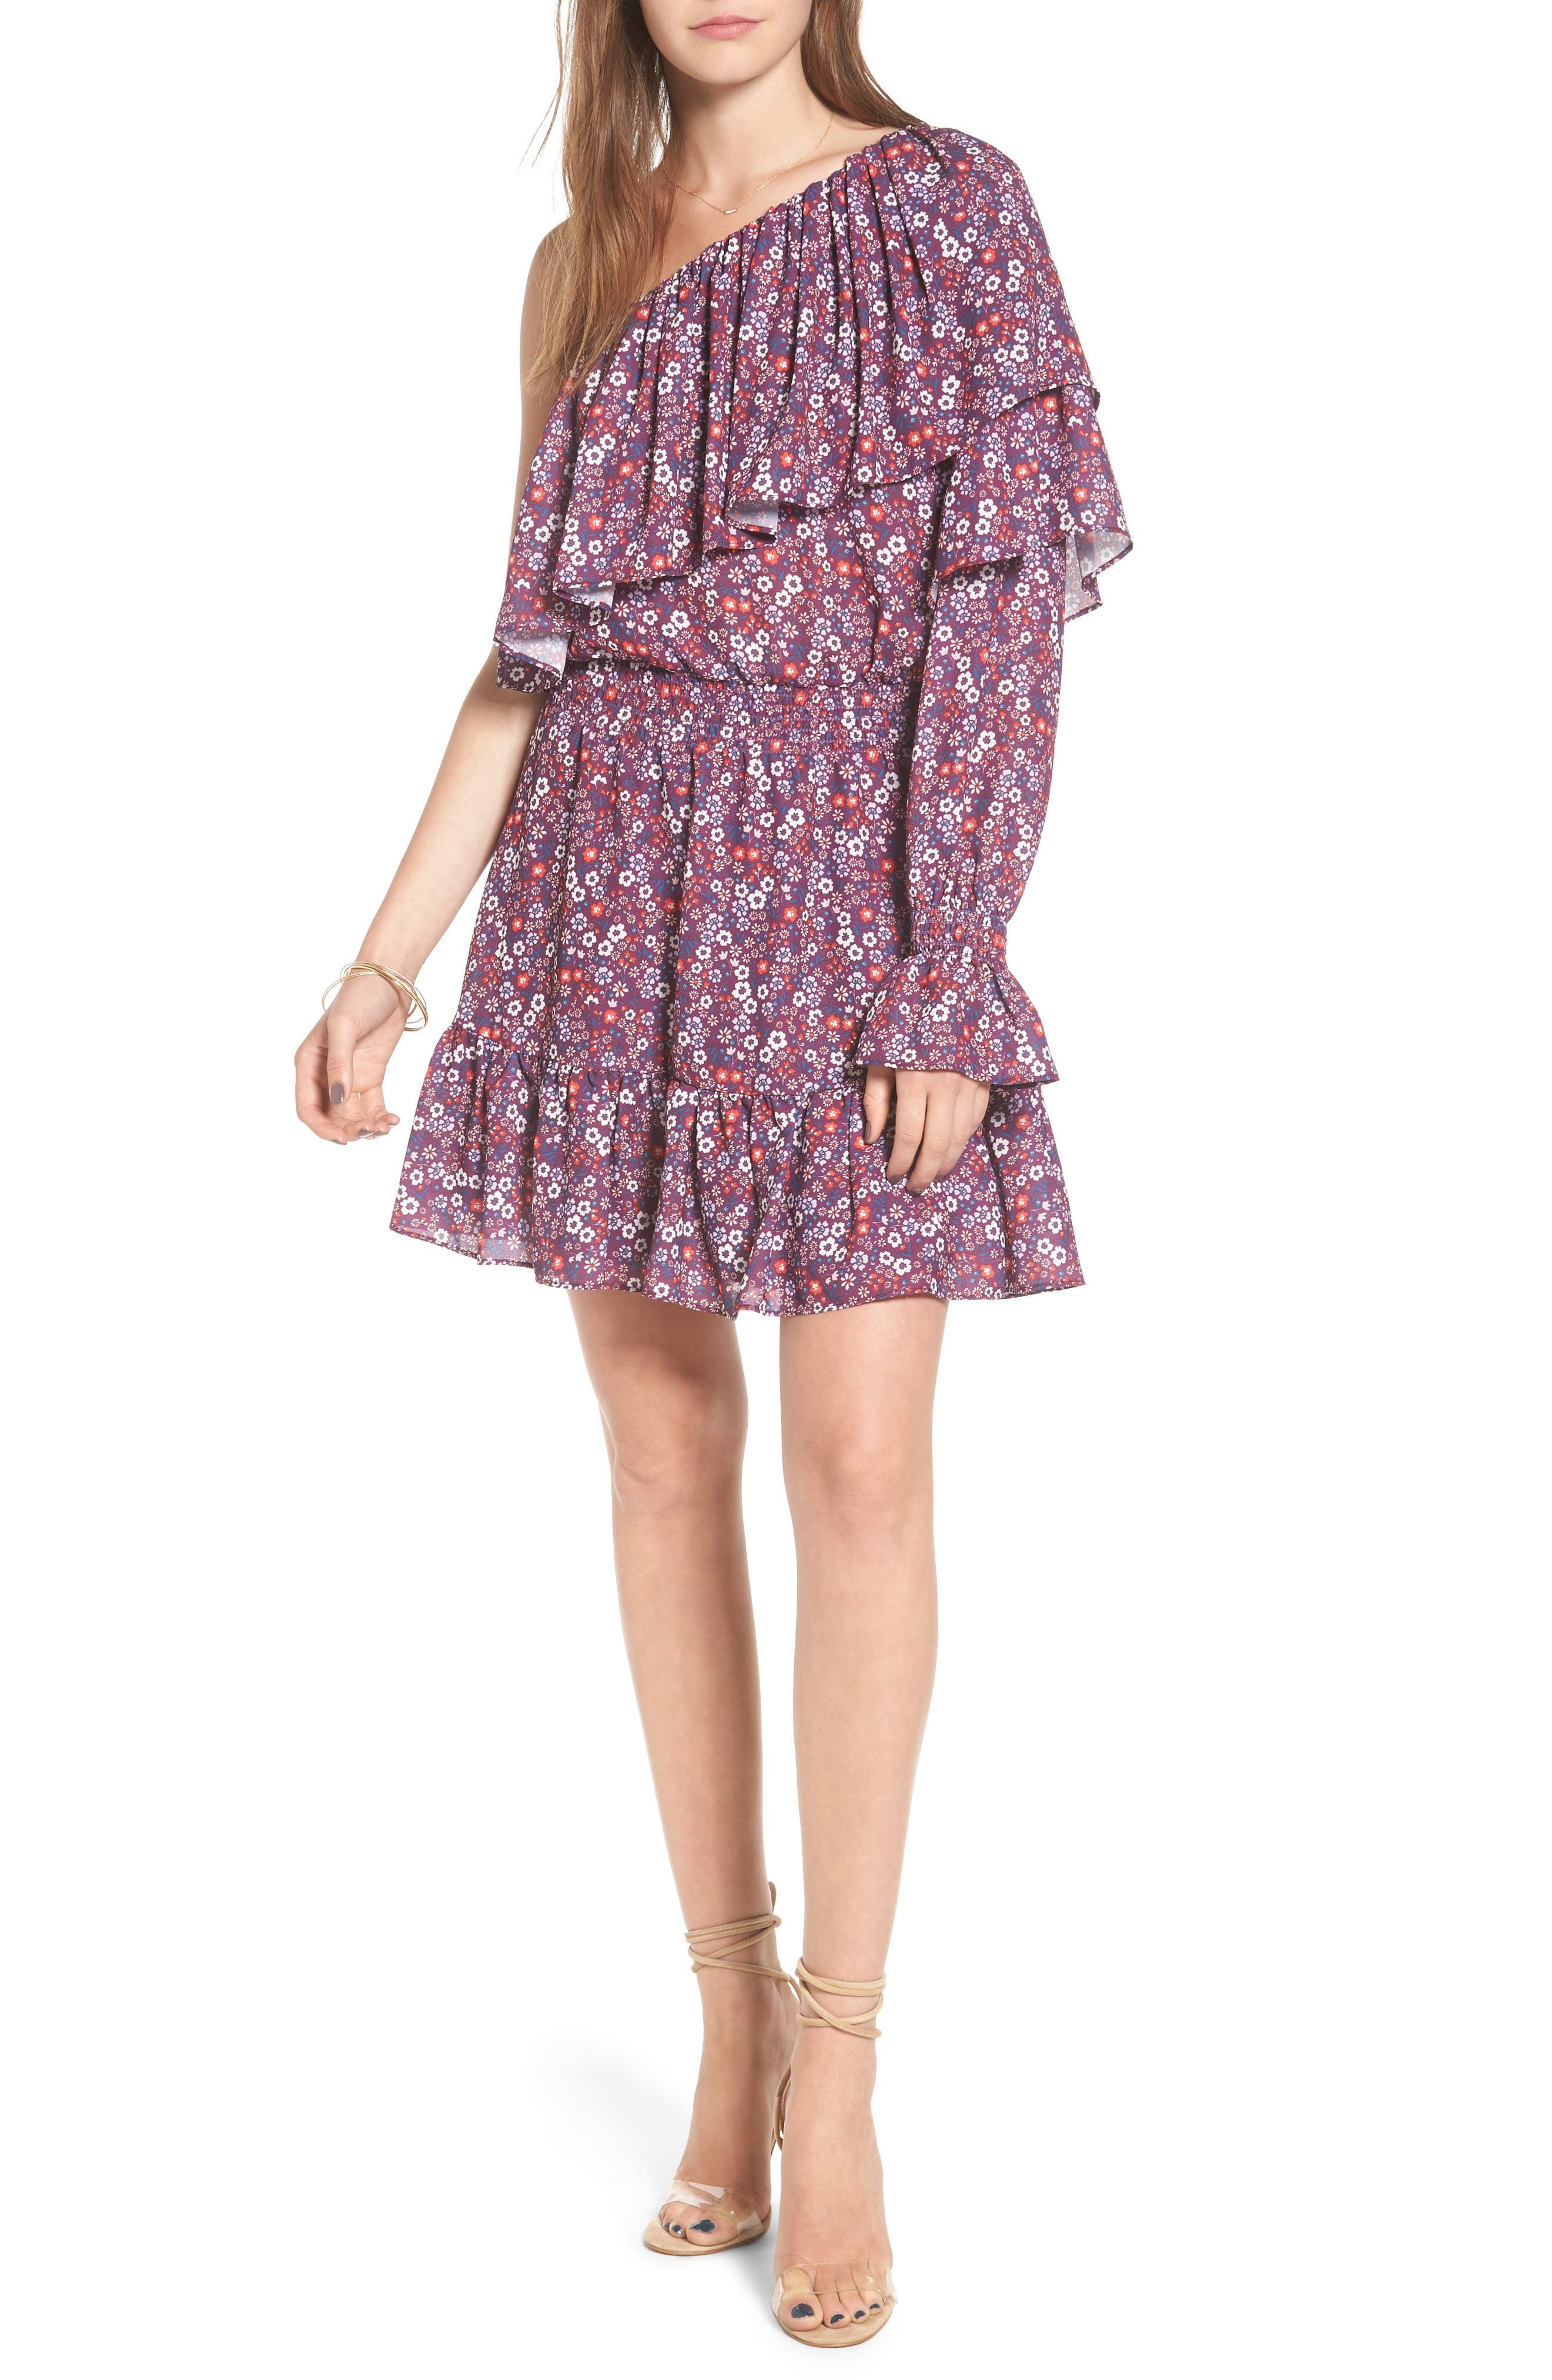 Alternate Image 1 Selected - devlin Irina One-Shoulder Blouson Dress